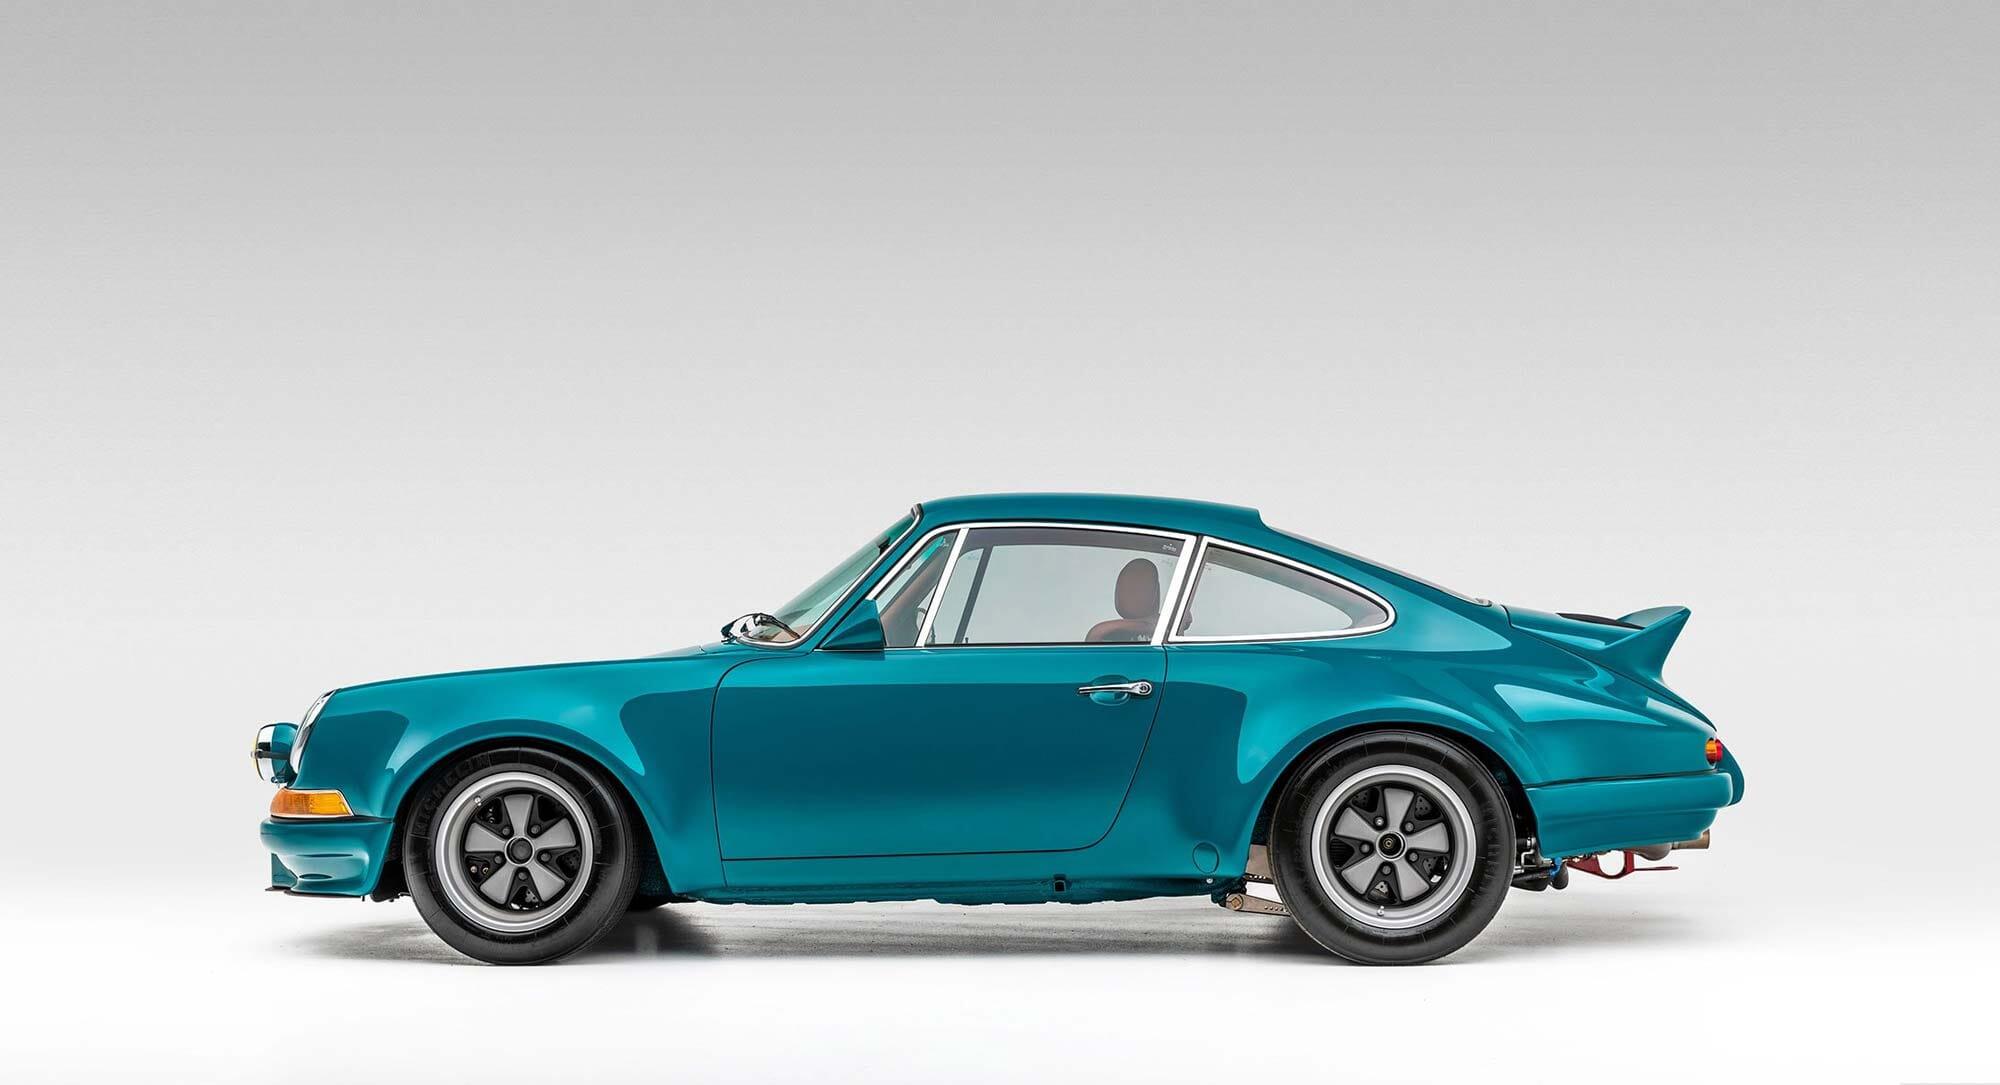 1975 Porsche 911 Twin Turbo: Summer style